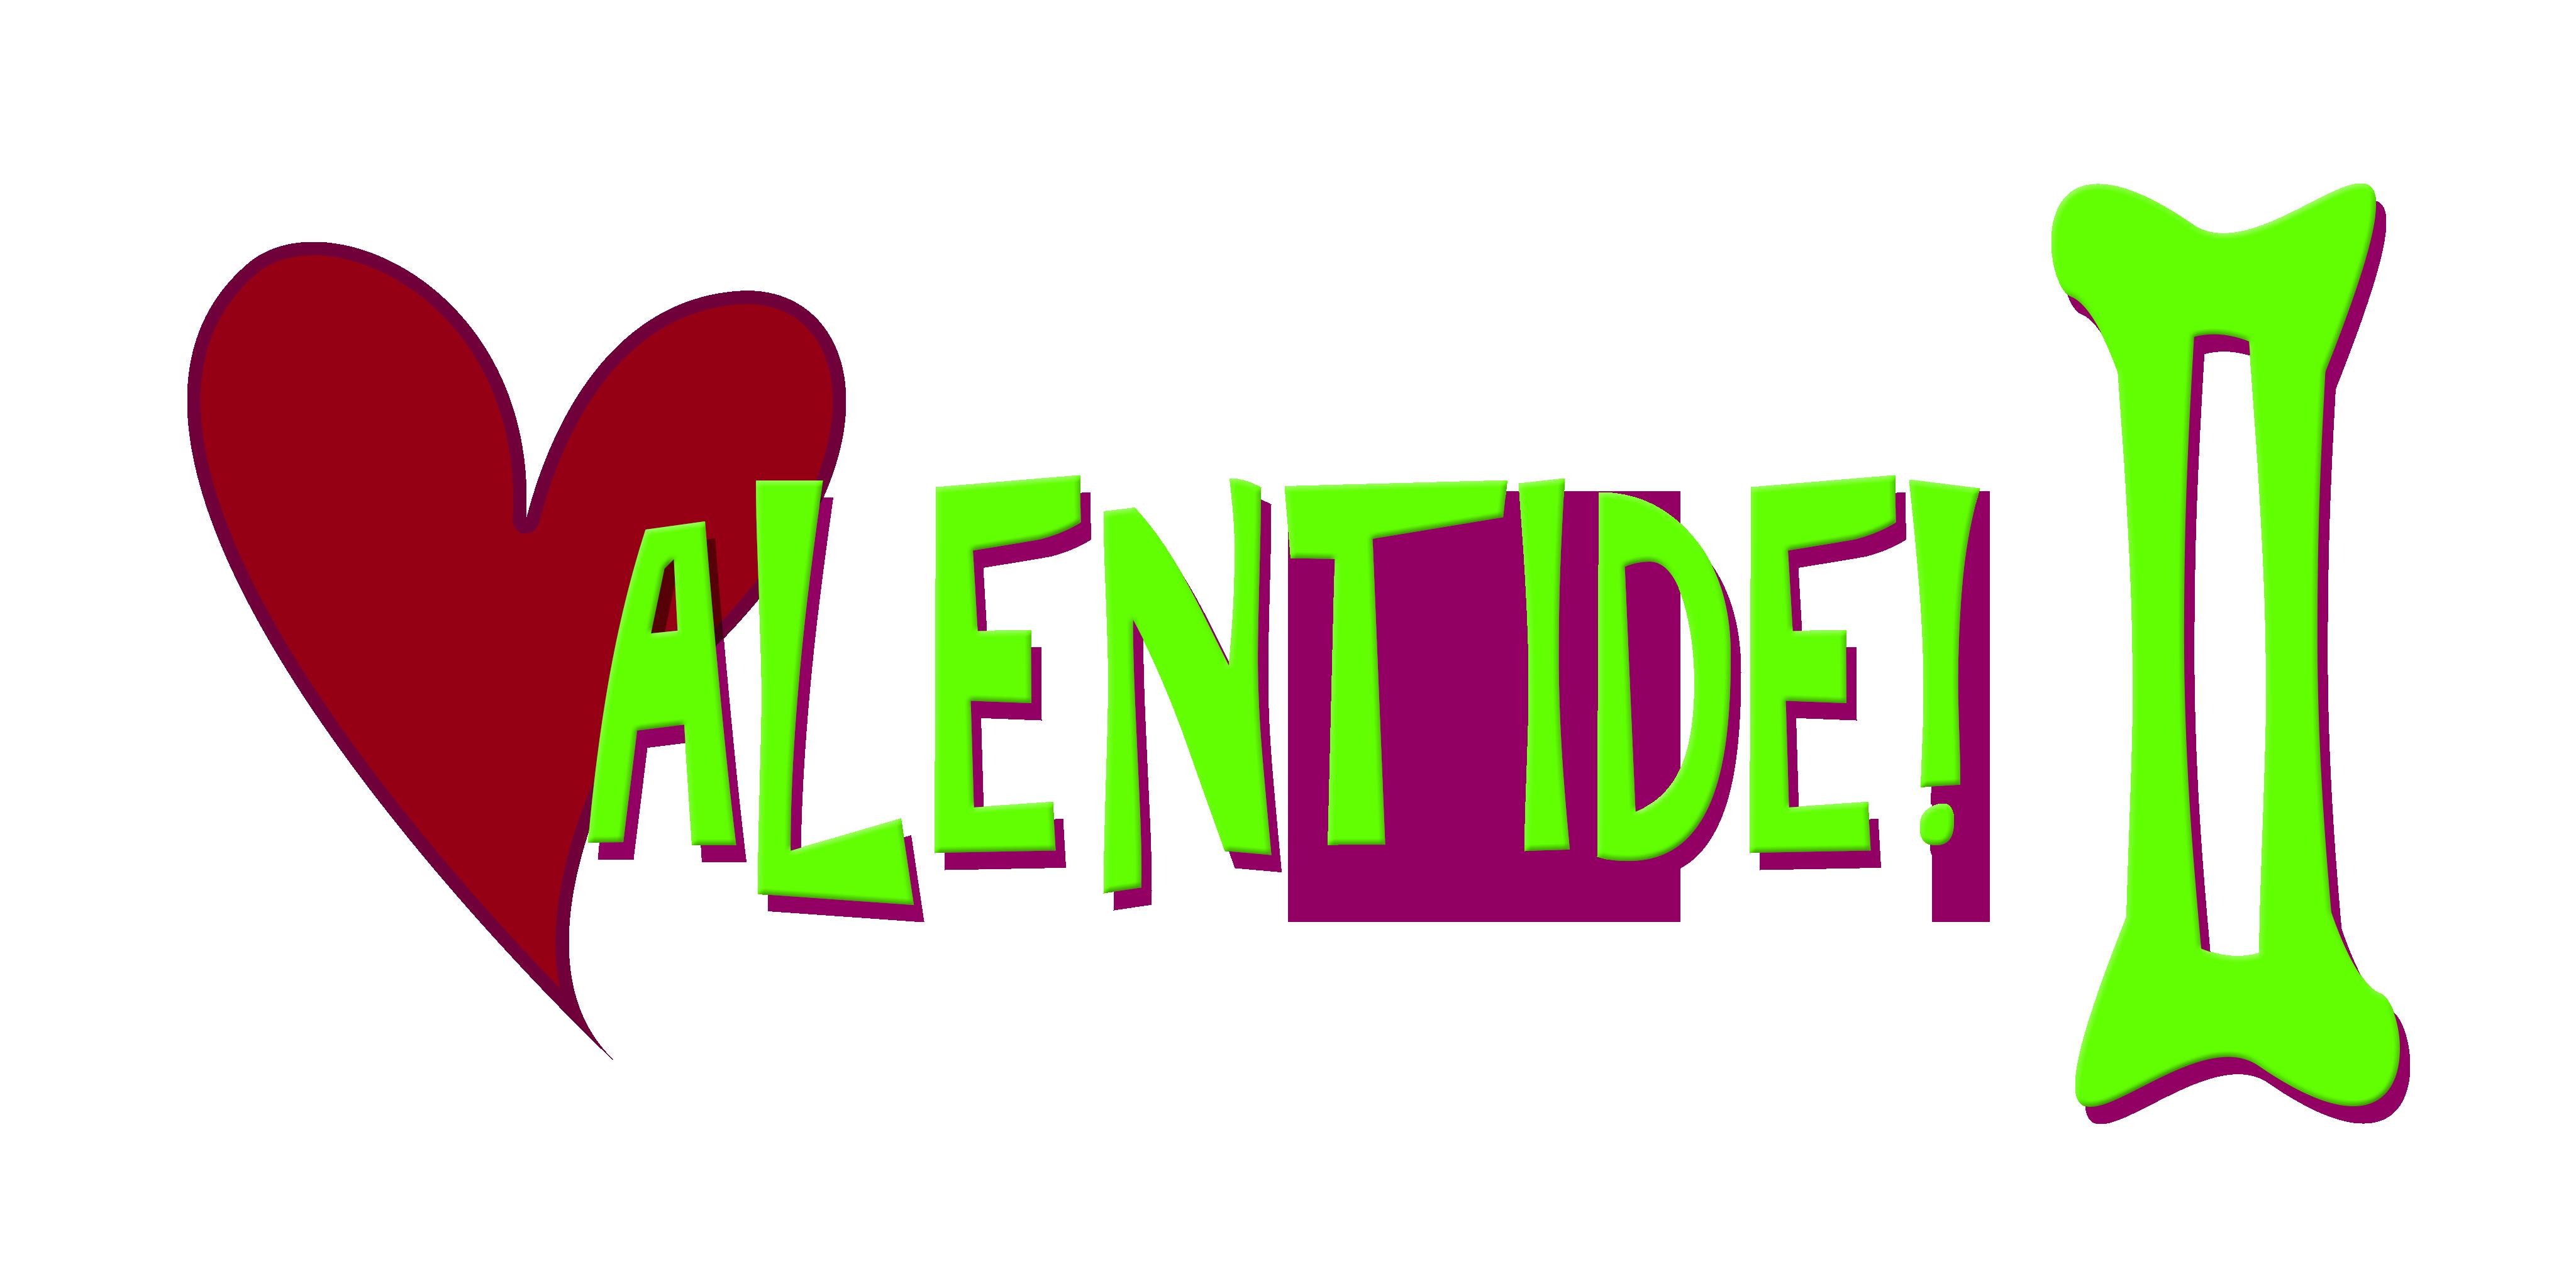 Valentide! II